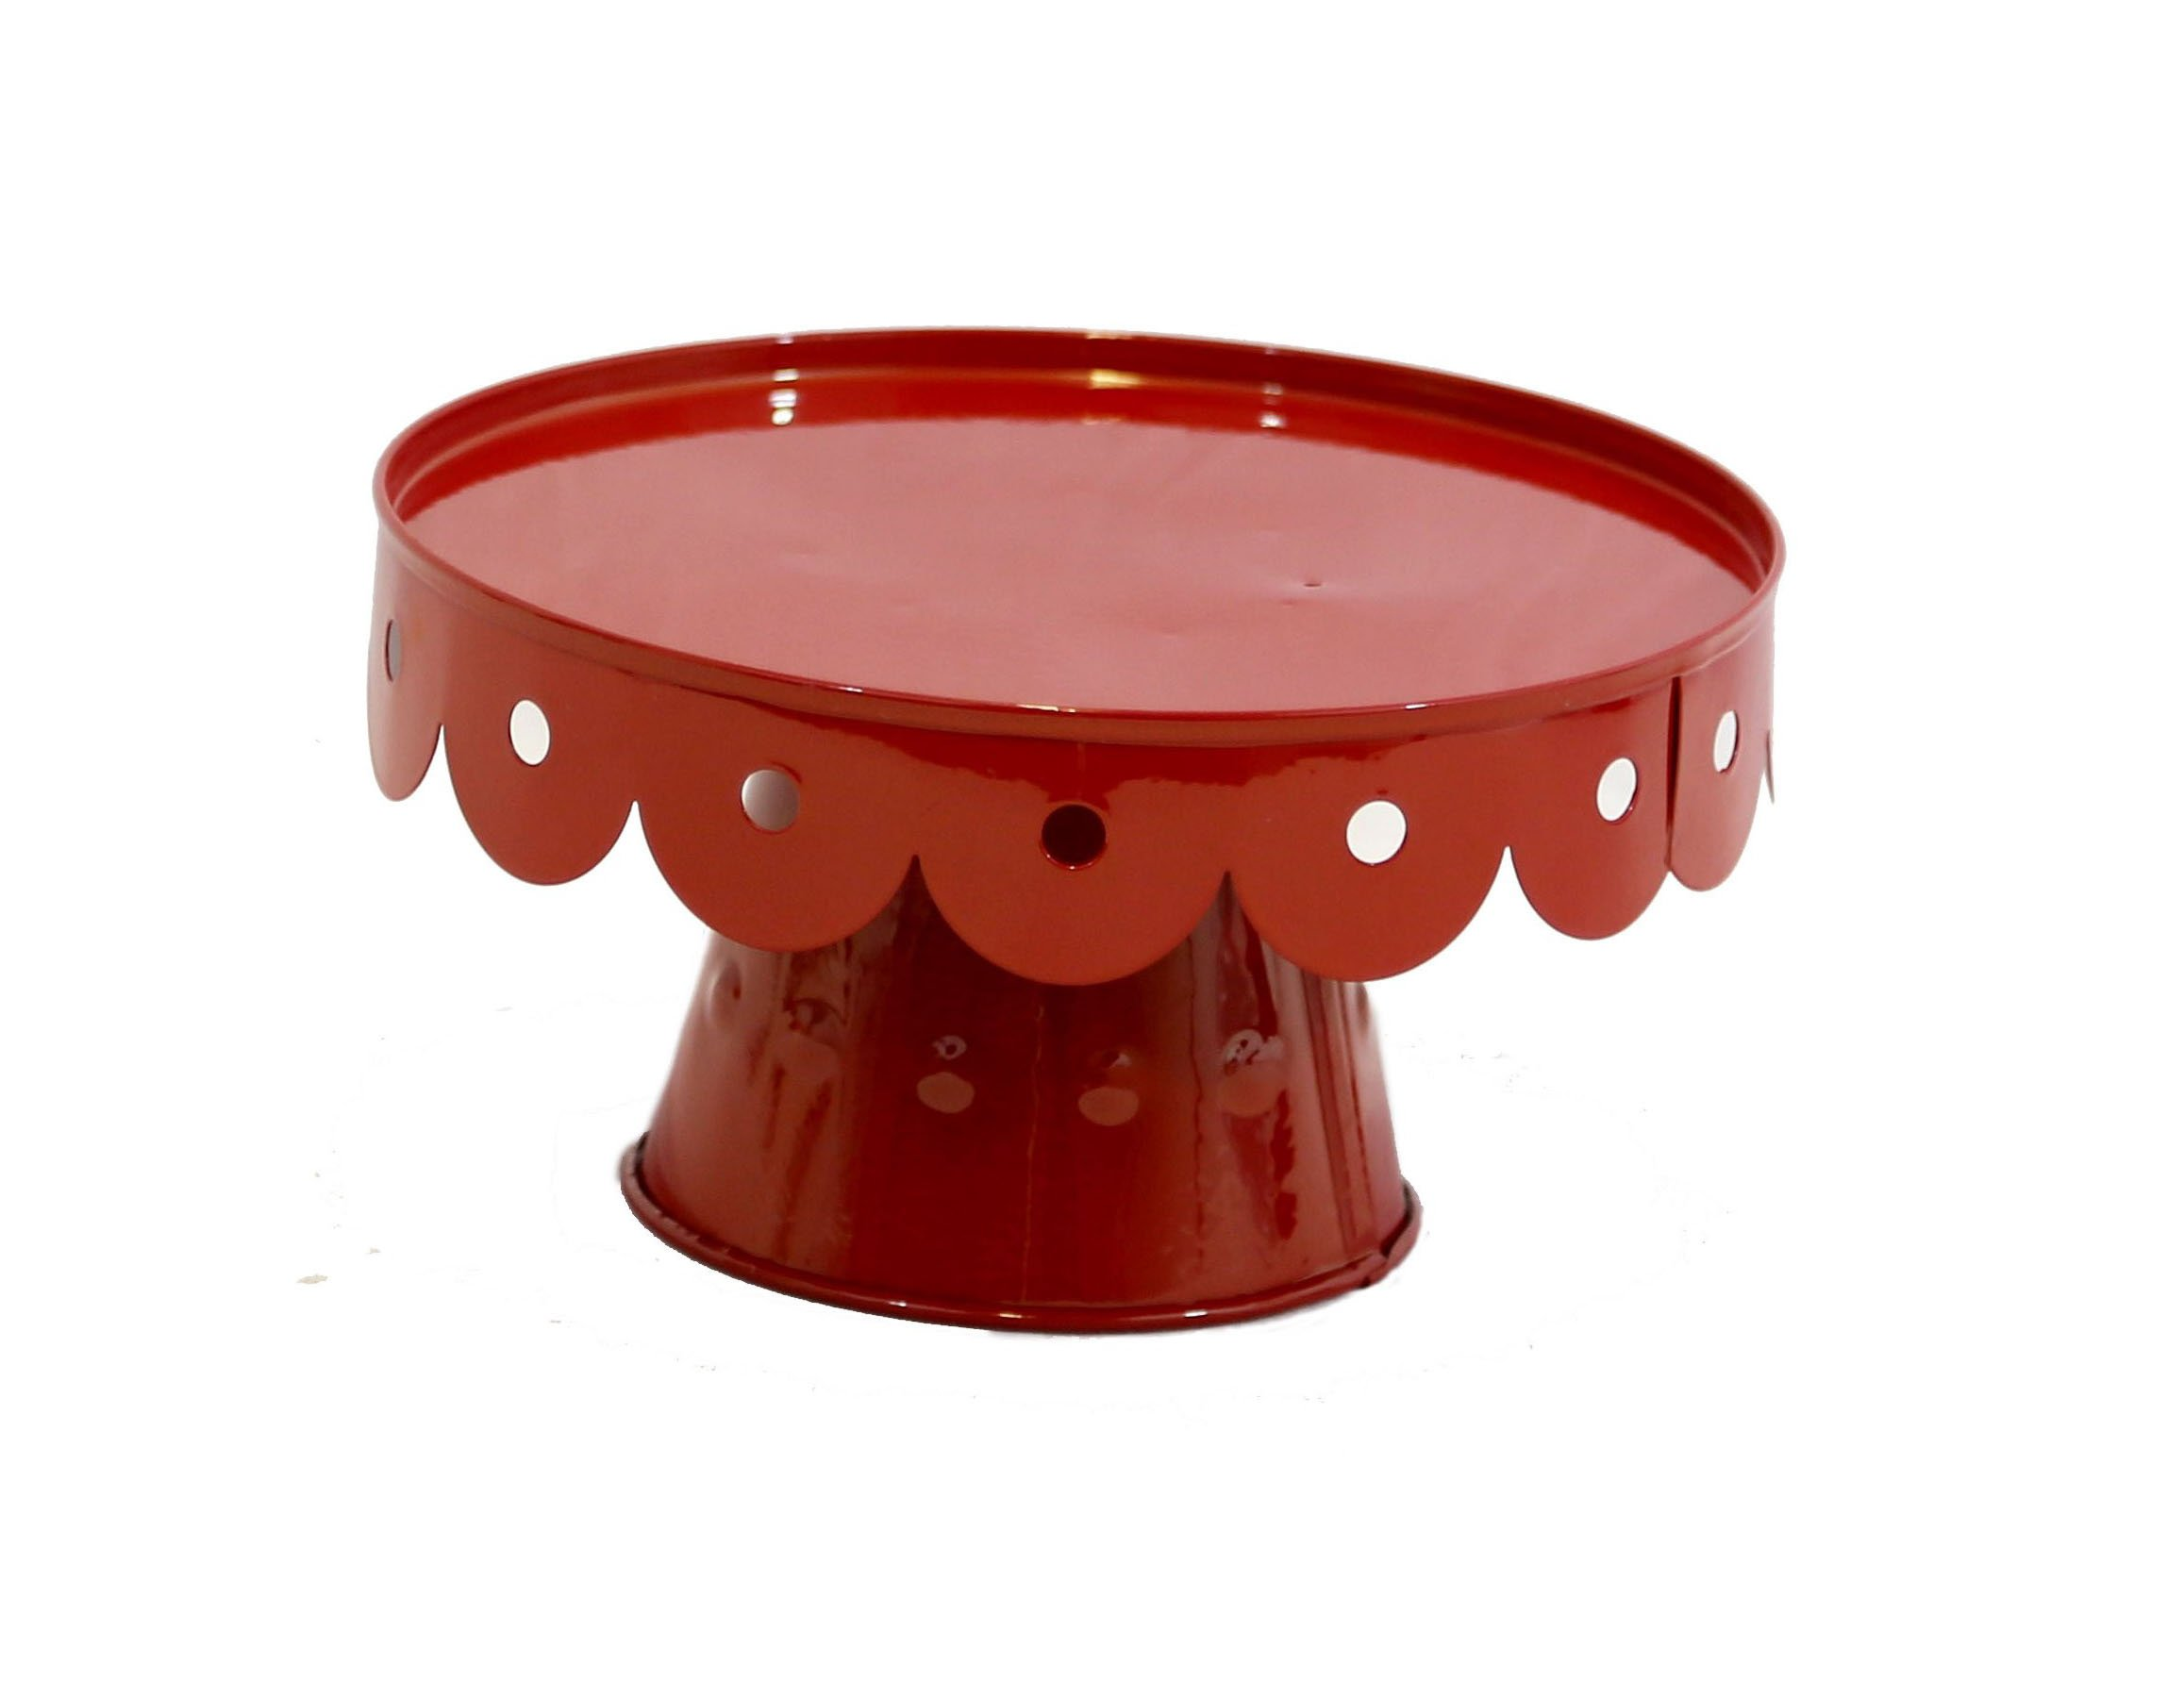 Medium Red Scalloped Cake Stand